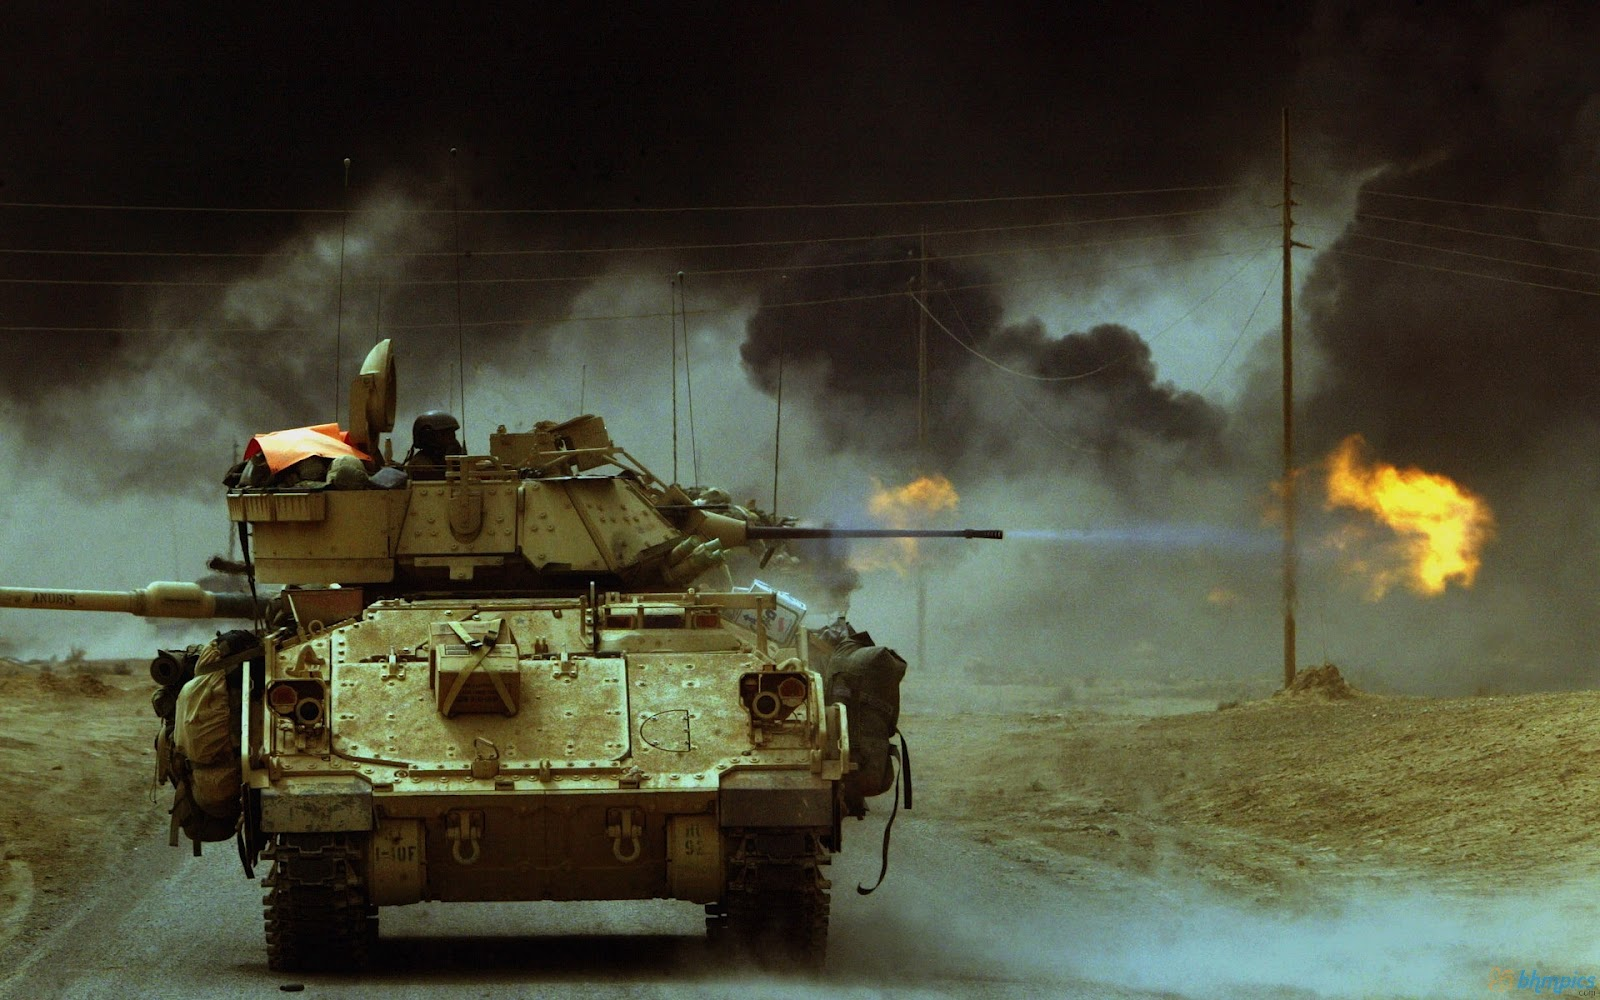 http://3.bp.blogspot.com/-grHl3GFUxD8/TzJTiTh2MdI/AAAAAAAAApA/eyiUbTucVD4/s1600/bradley_tanks_fire_in_iraq-1920x1200.jpg